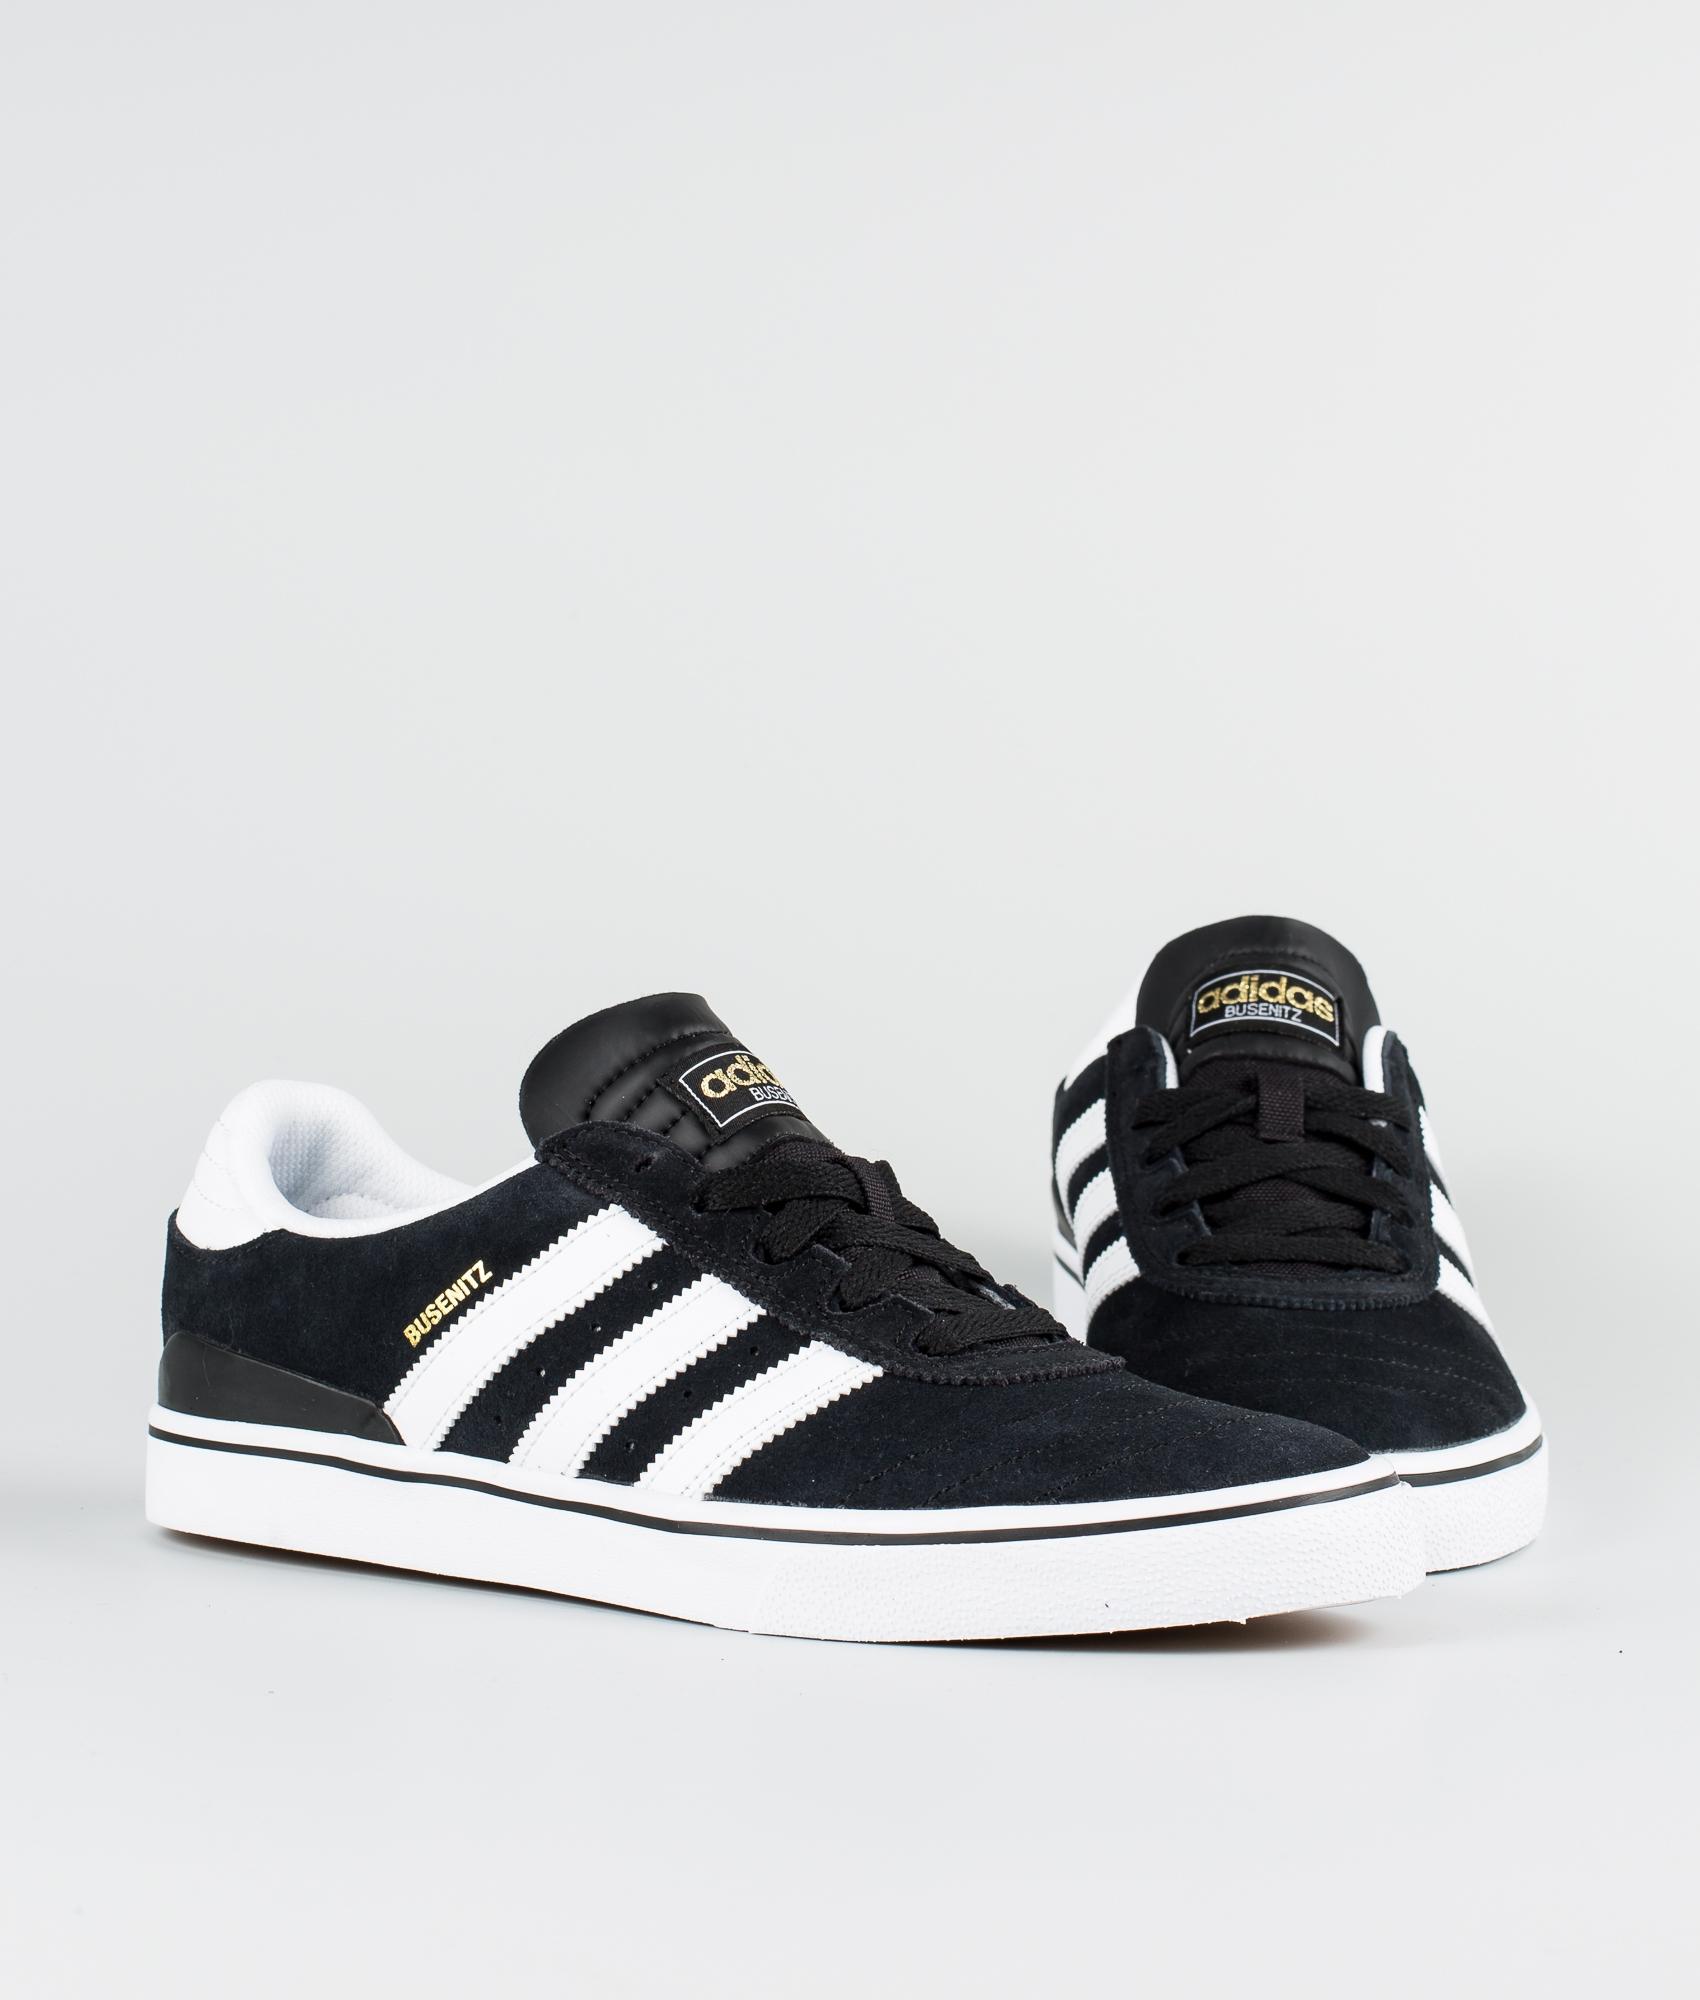 Busenitz Skateboarding Adidas Vulc Whiteblack1 Schuhe Black1running OZTXwPulki